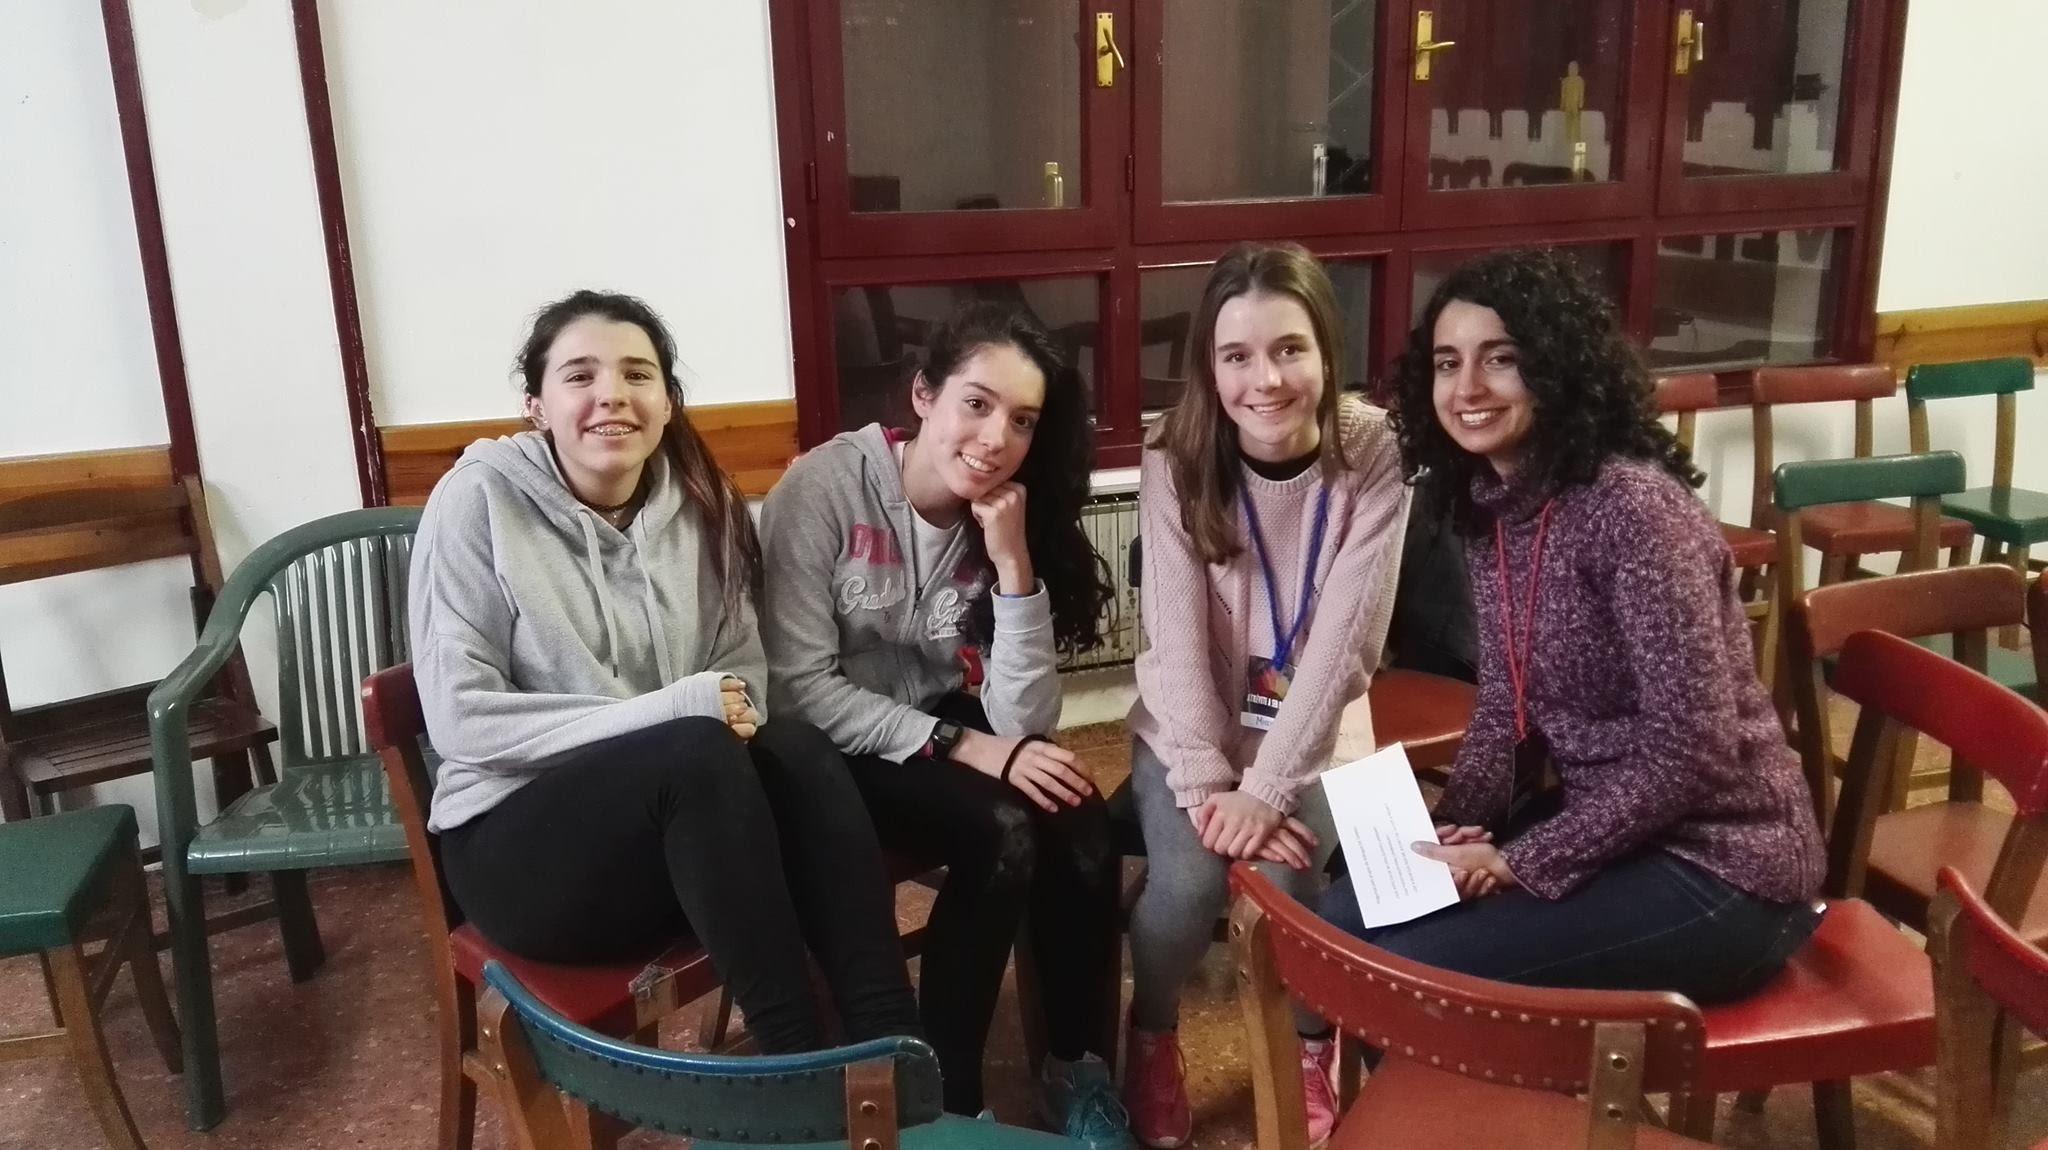 2017.02.17y18 - Desafió ATREVETE A SER DIFERENTE (20).jpg